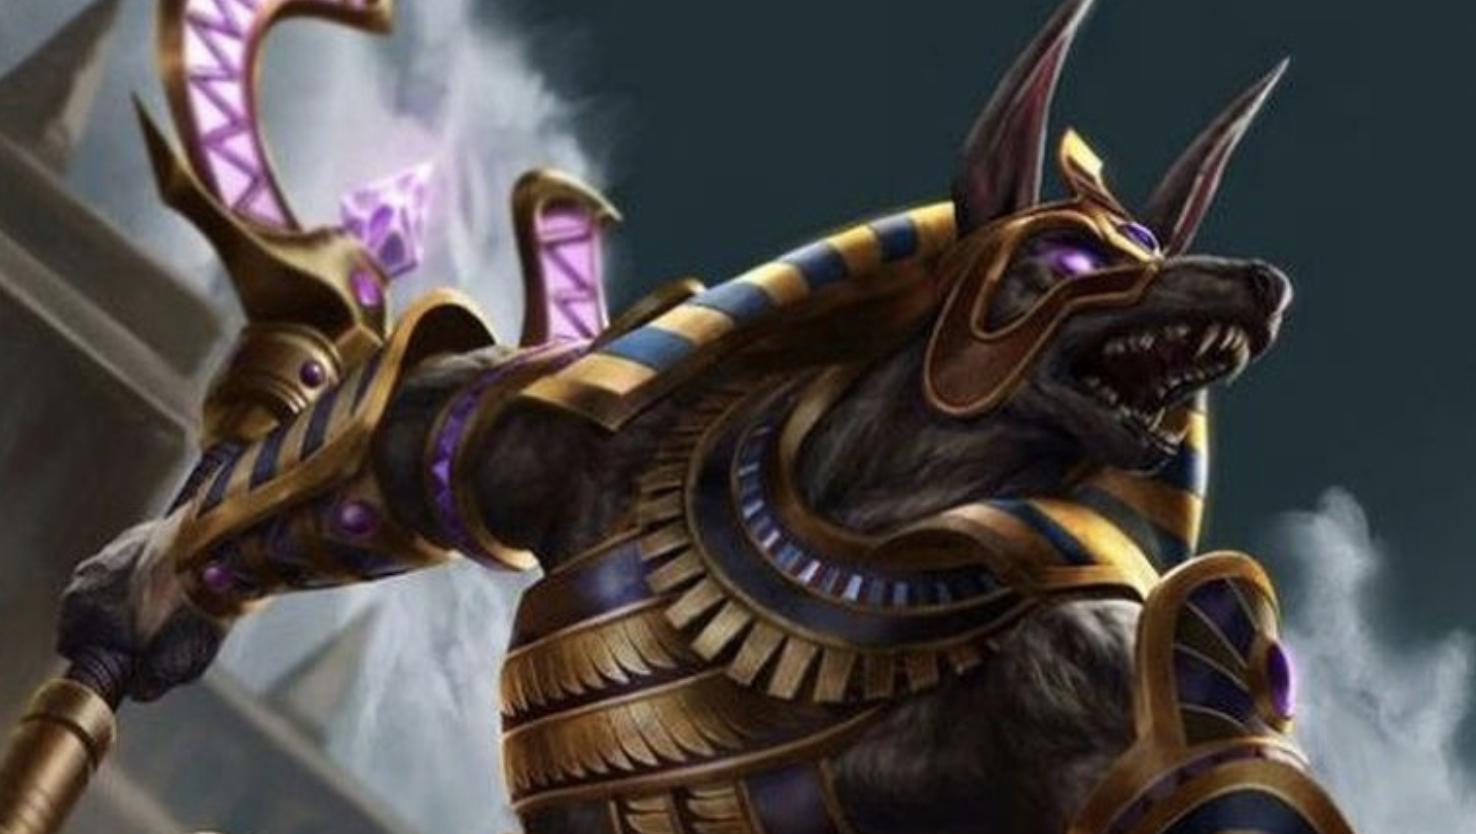 Anubis: The Ancient Egyptian Jackal God